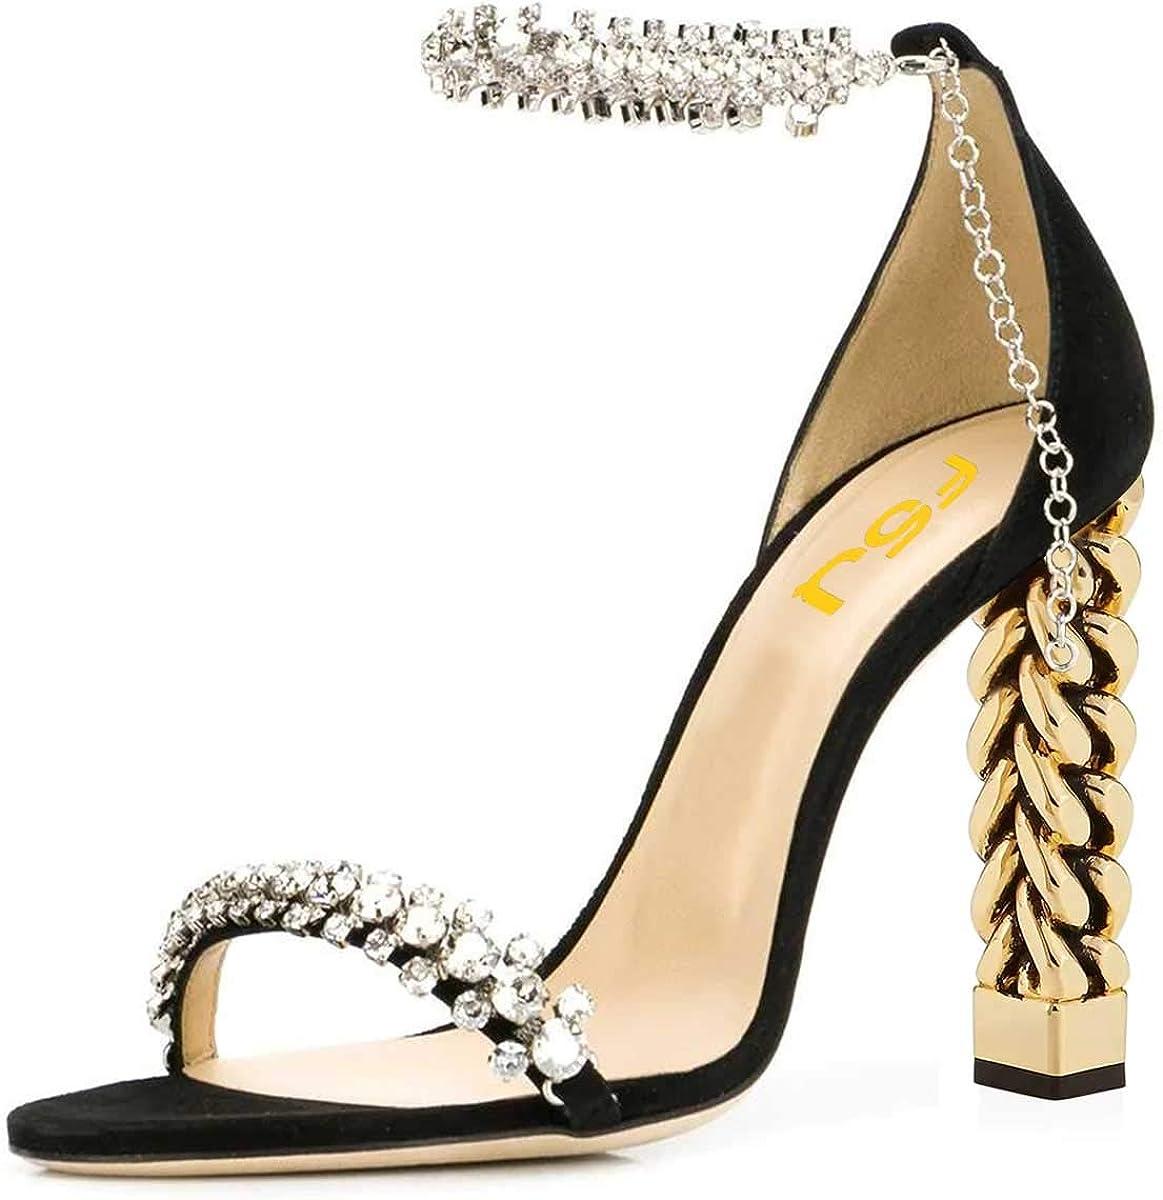 FSJ Women Flower Gold Metal Chain Chunky High Heels Ankle Strap Sandals Open Toe Fashion Shoes Size 4-15 US